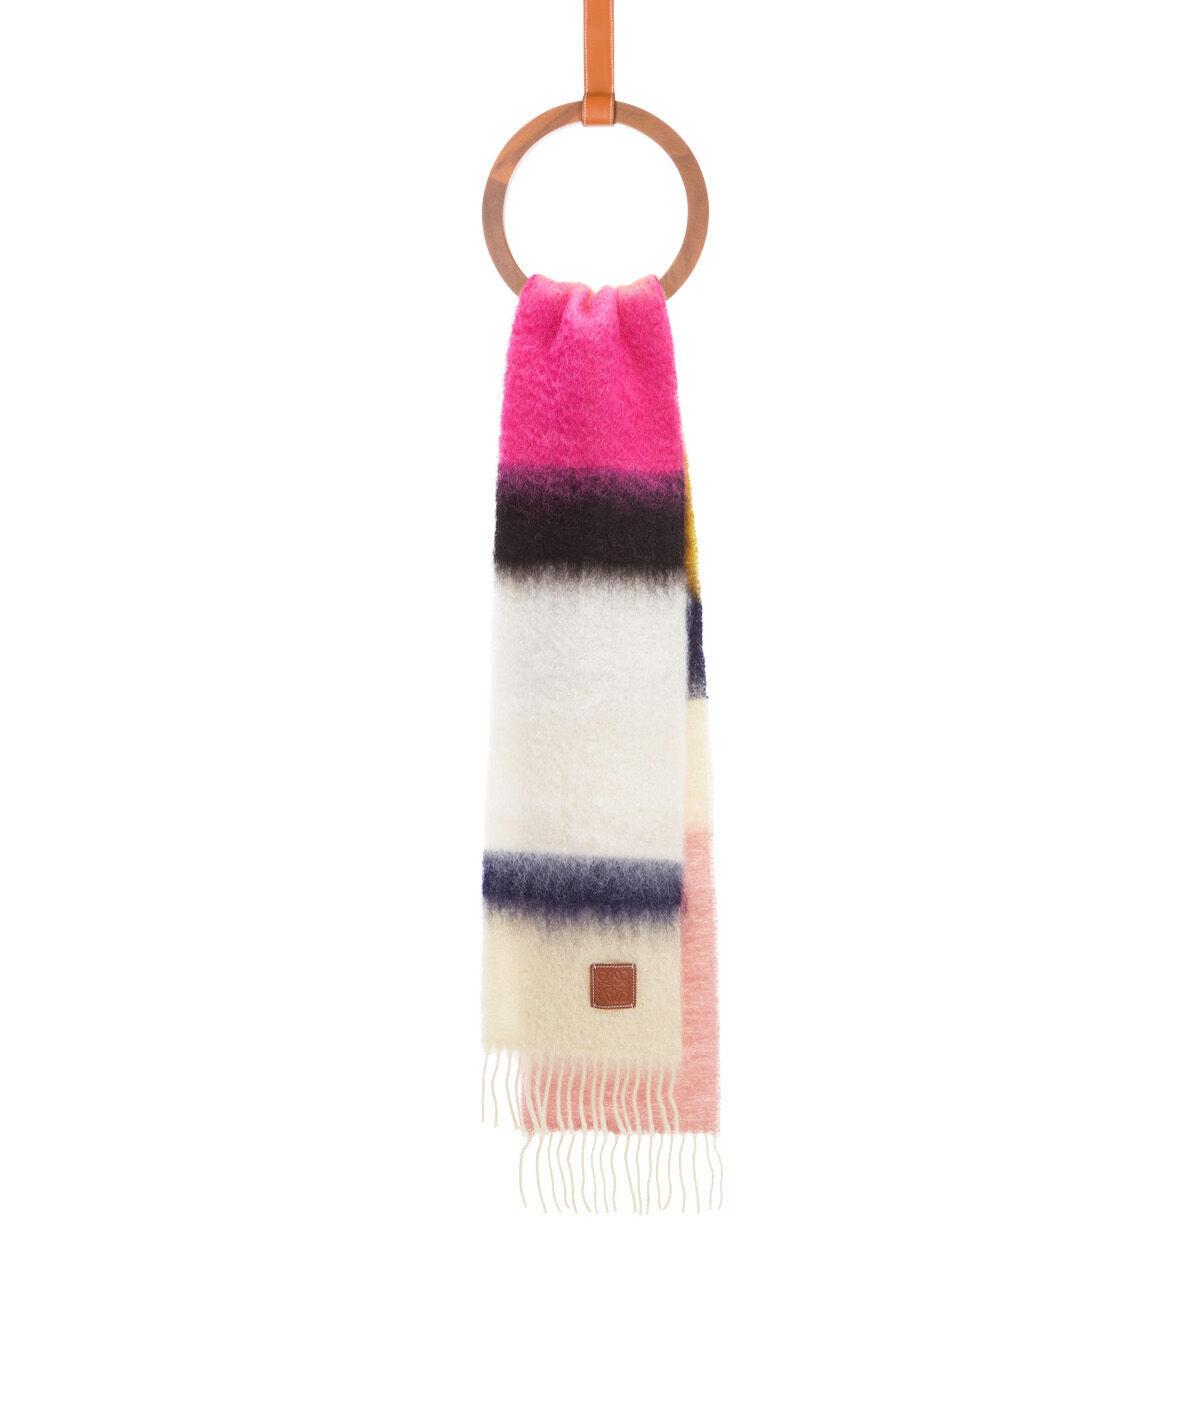 LOEWE 23X185 Scarf Stripes Pink/Black front